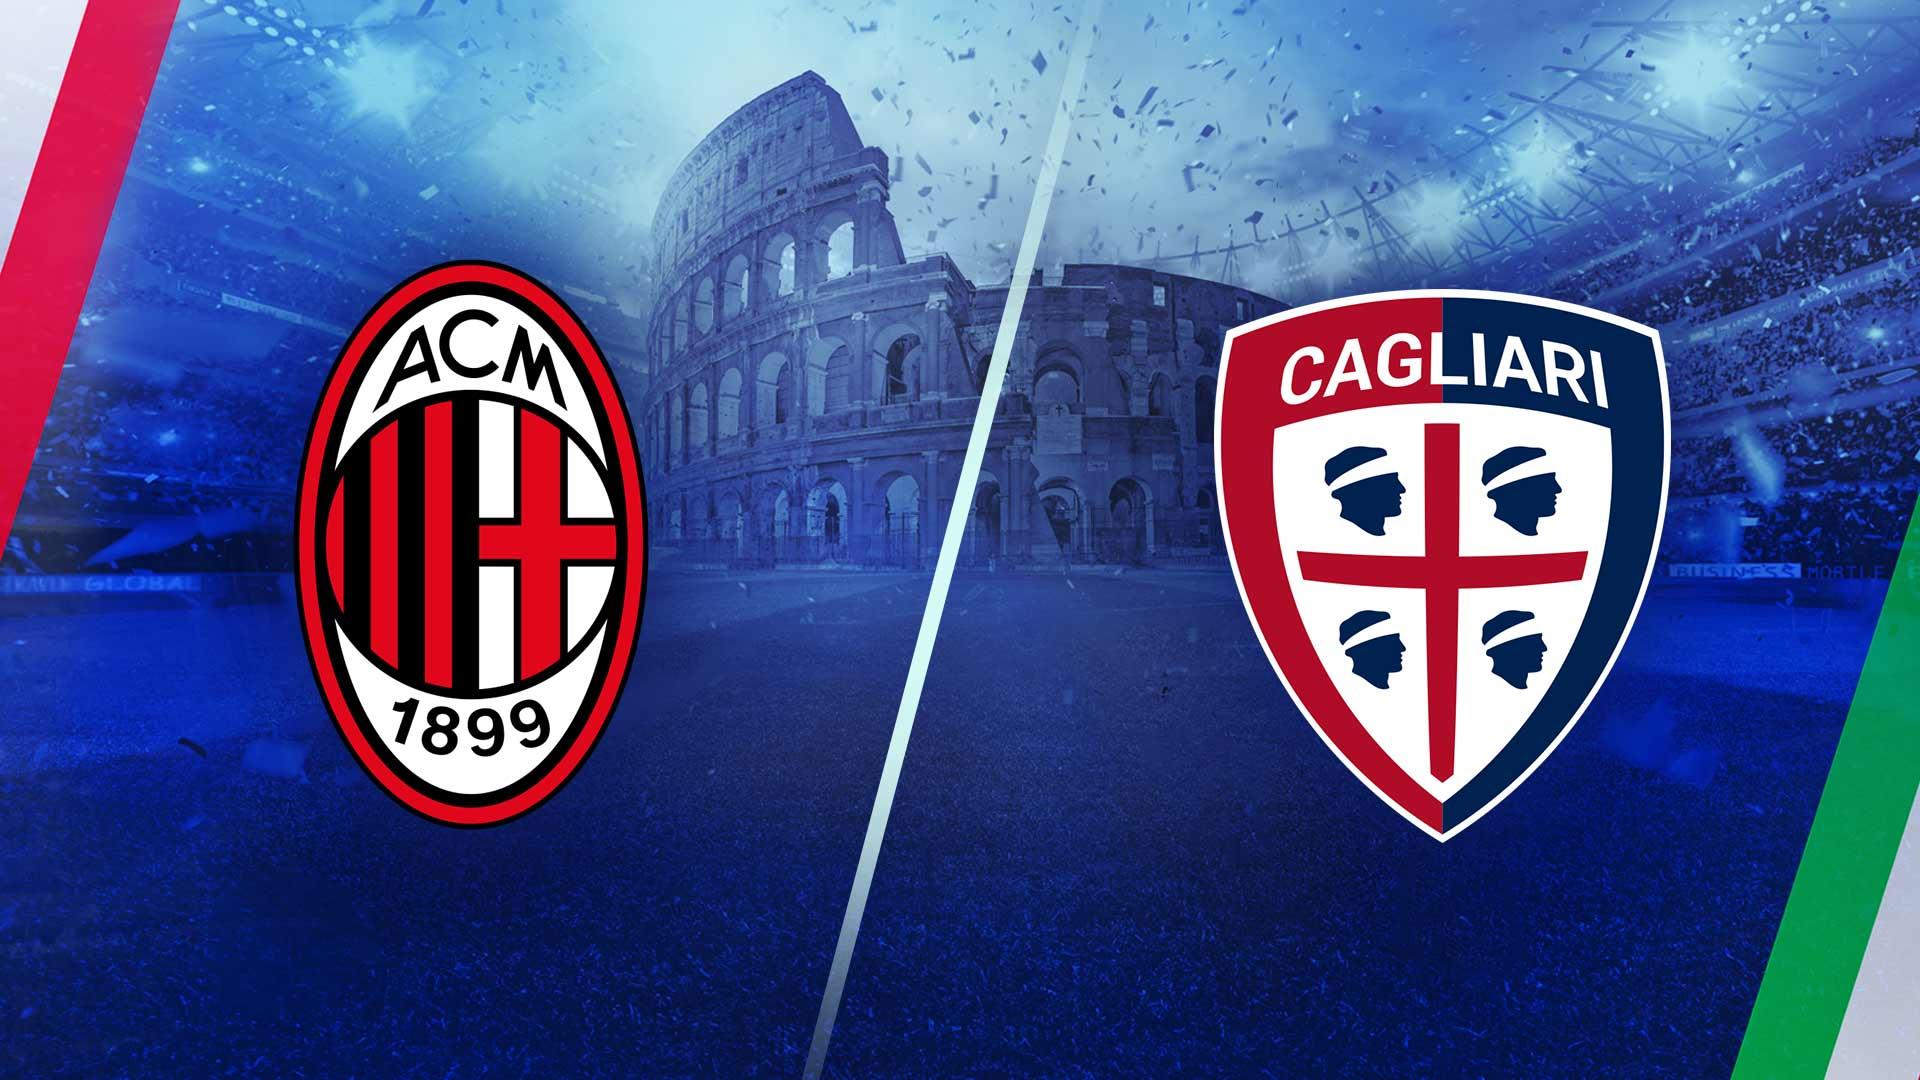 AC Milan vs Cagliari Highlights 29 August 2021